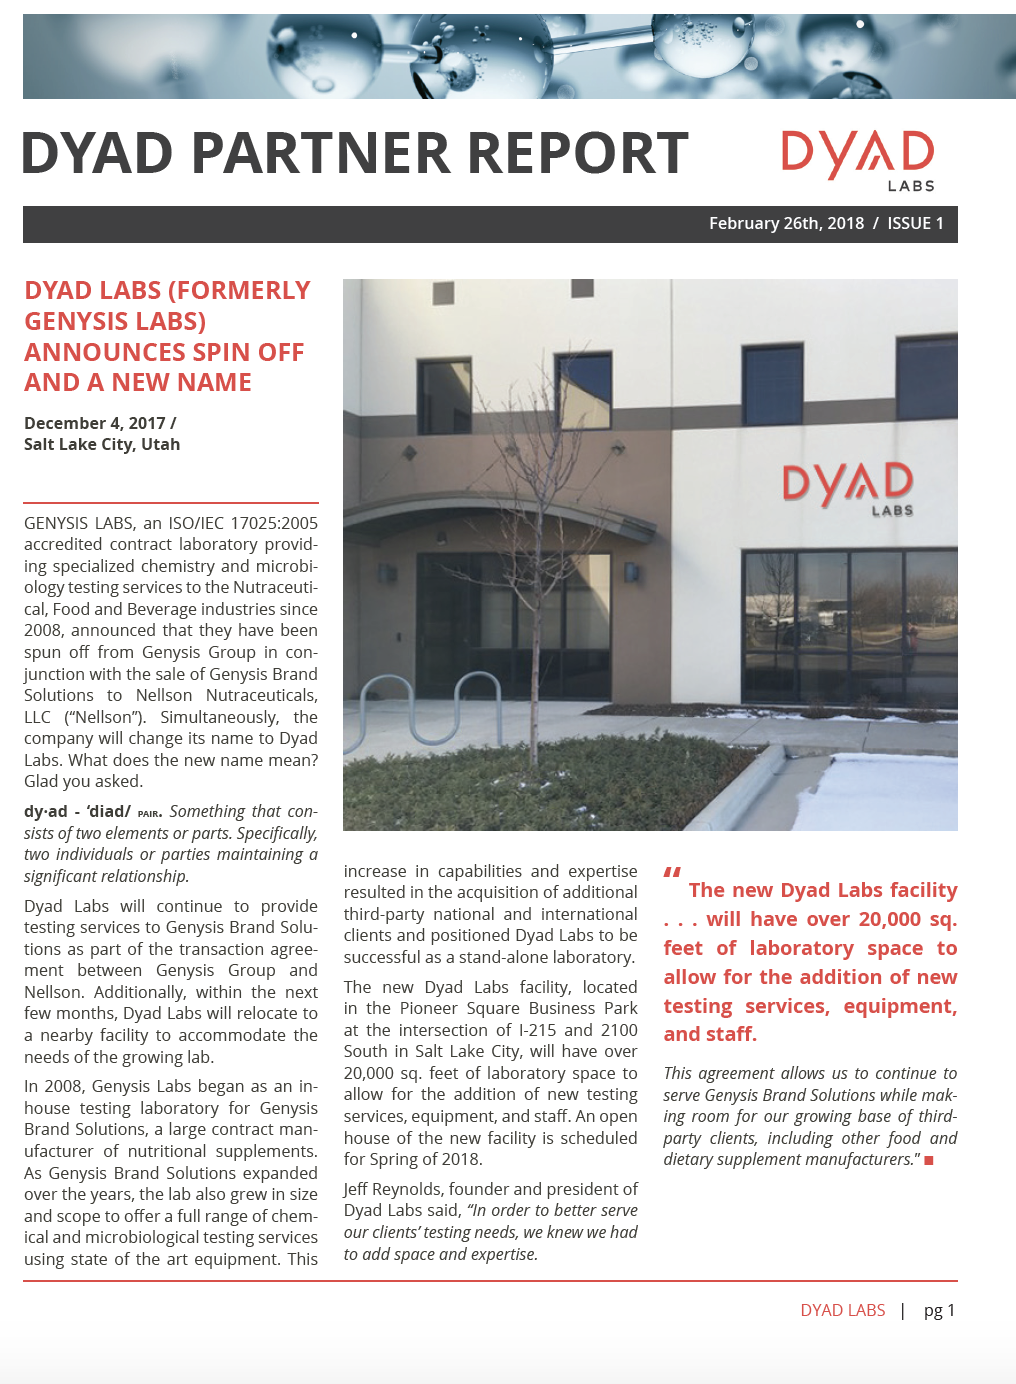 Dyad Partner Report – Dyad Labs